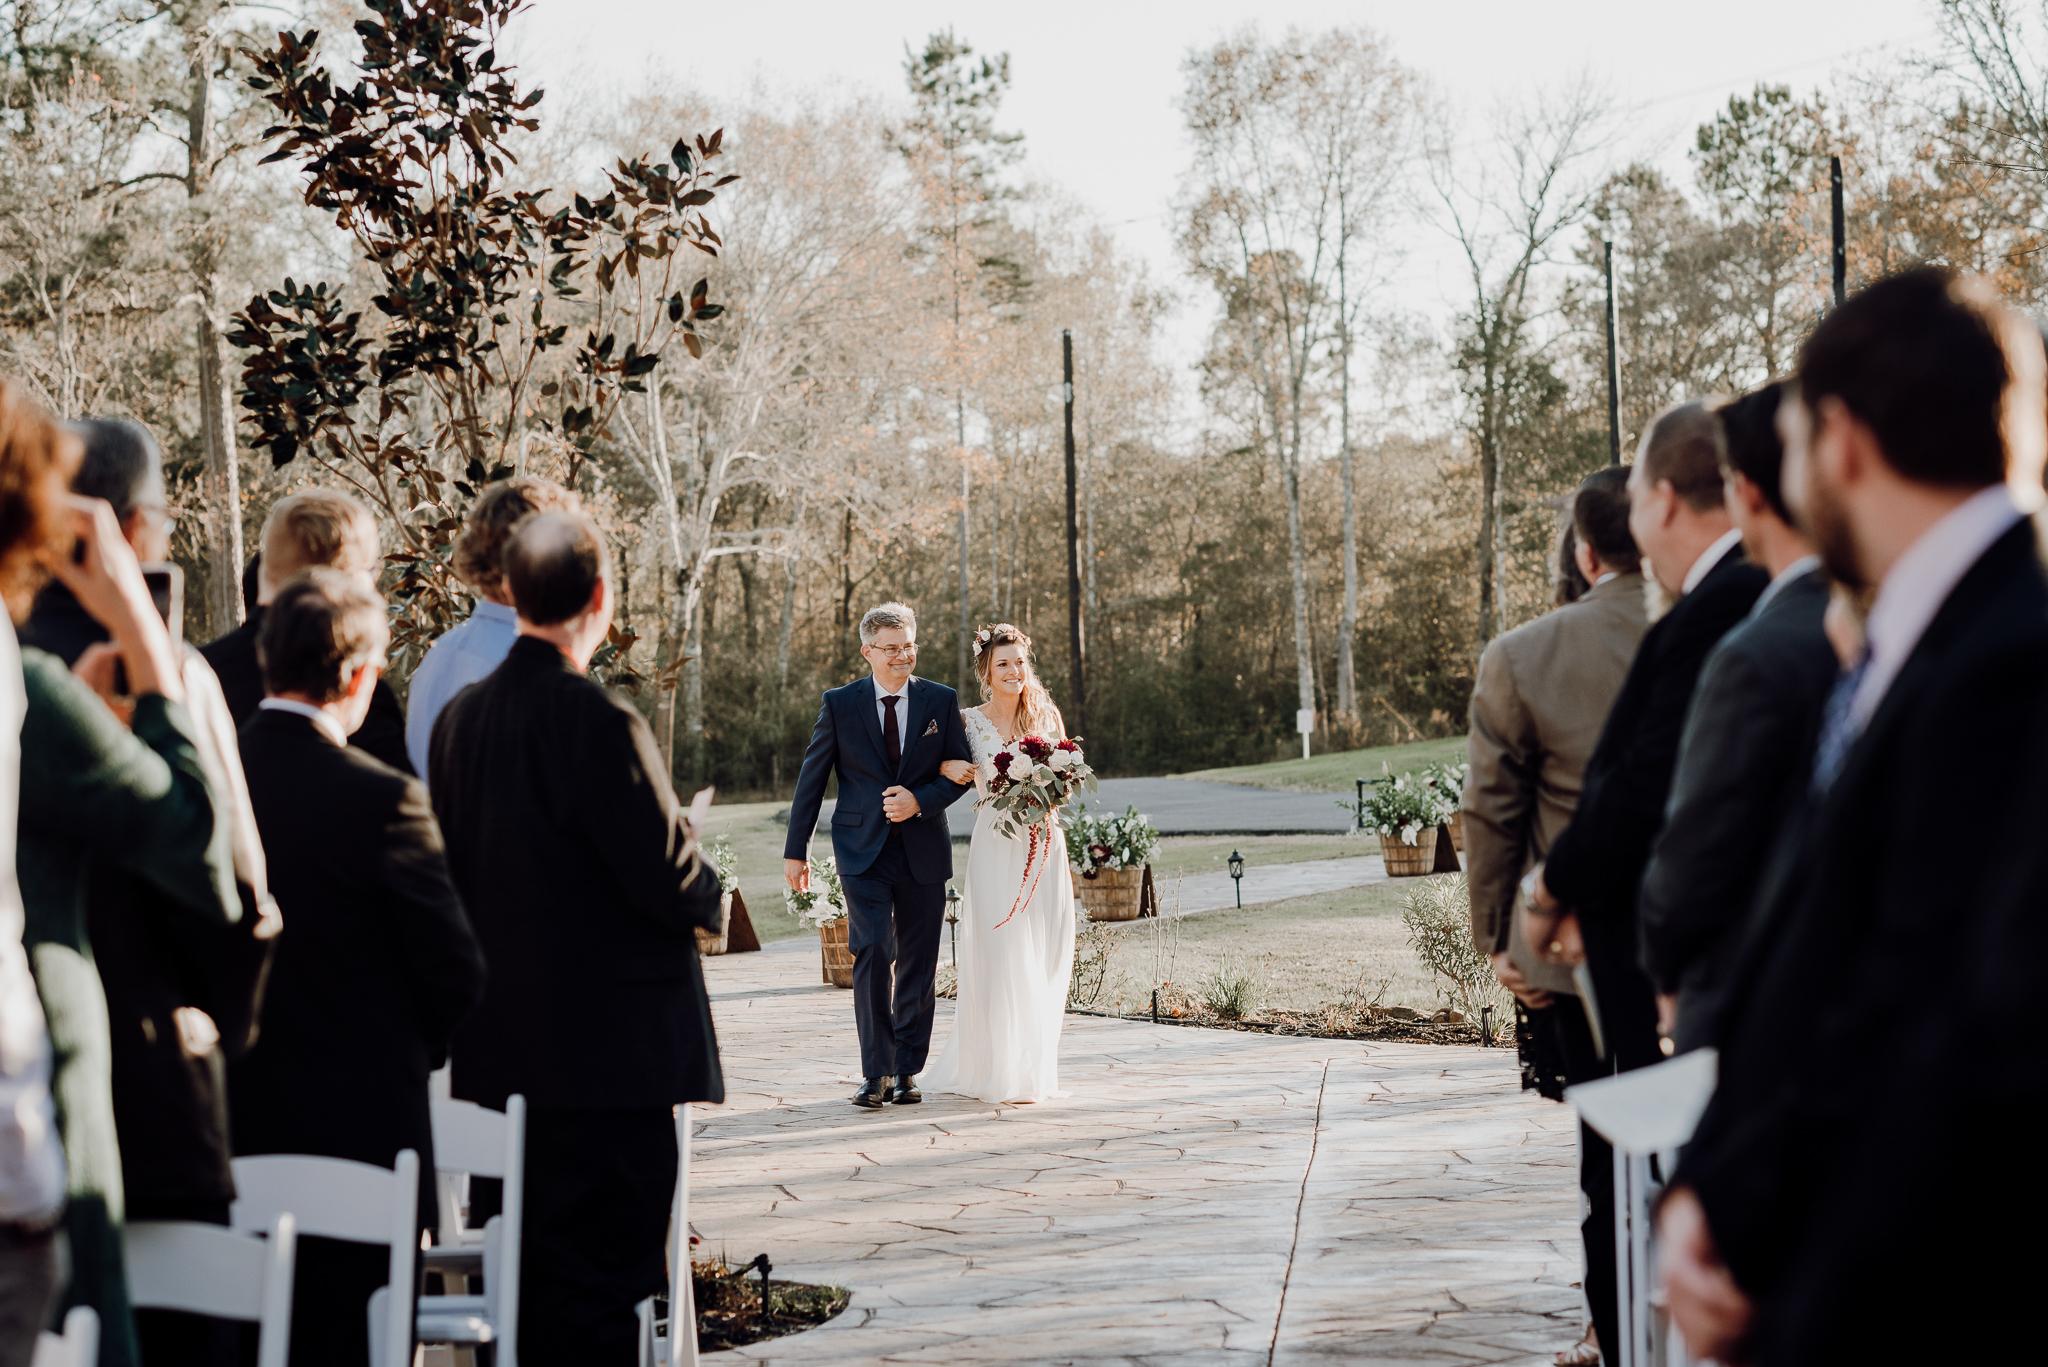 Michelle + Aron-Houston Wedding Photographer-Magnolia Meadows-Winter Wedding | Kristen Giles Photography - 038.jpg